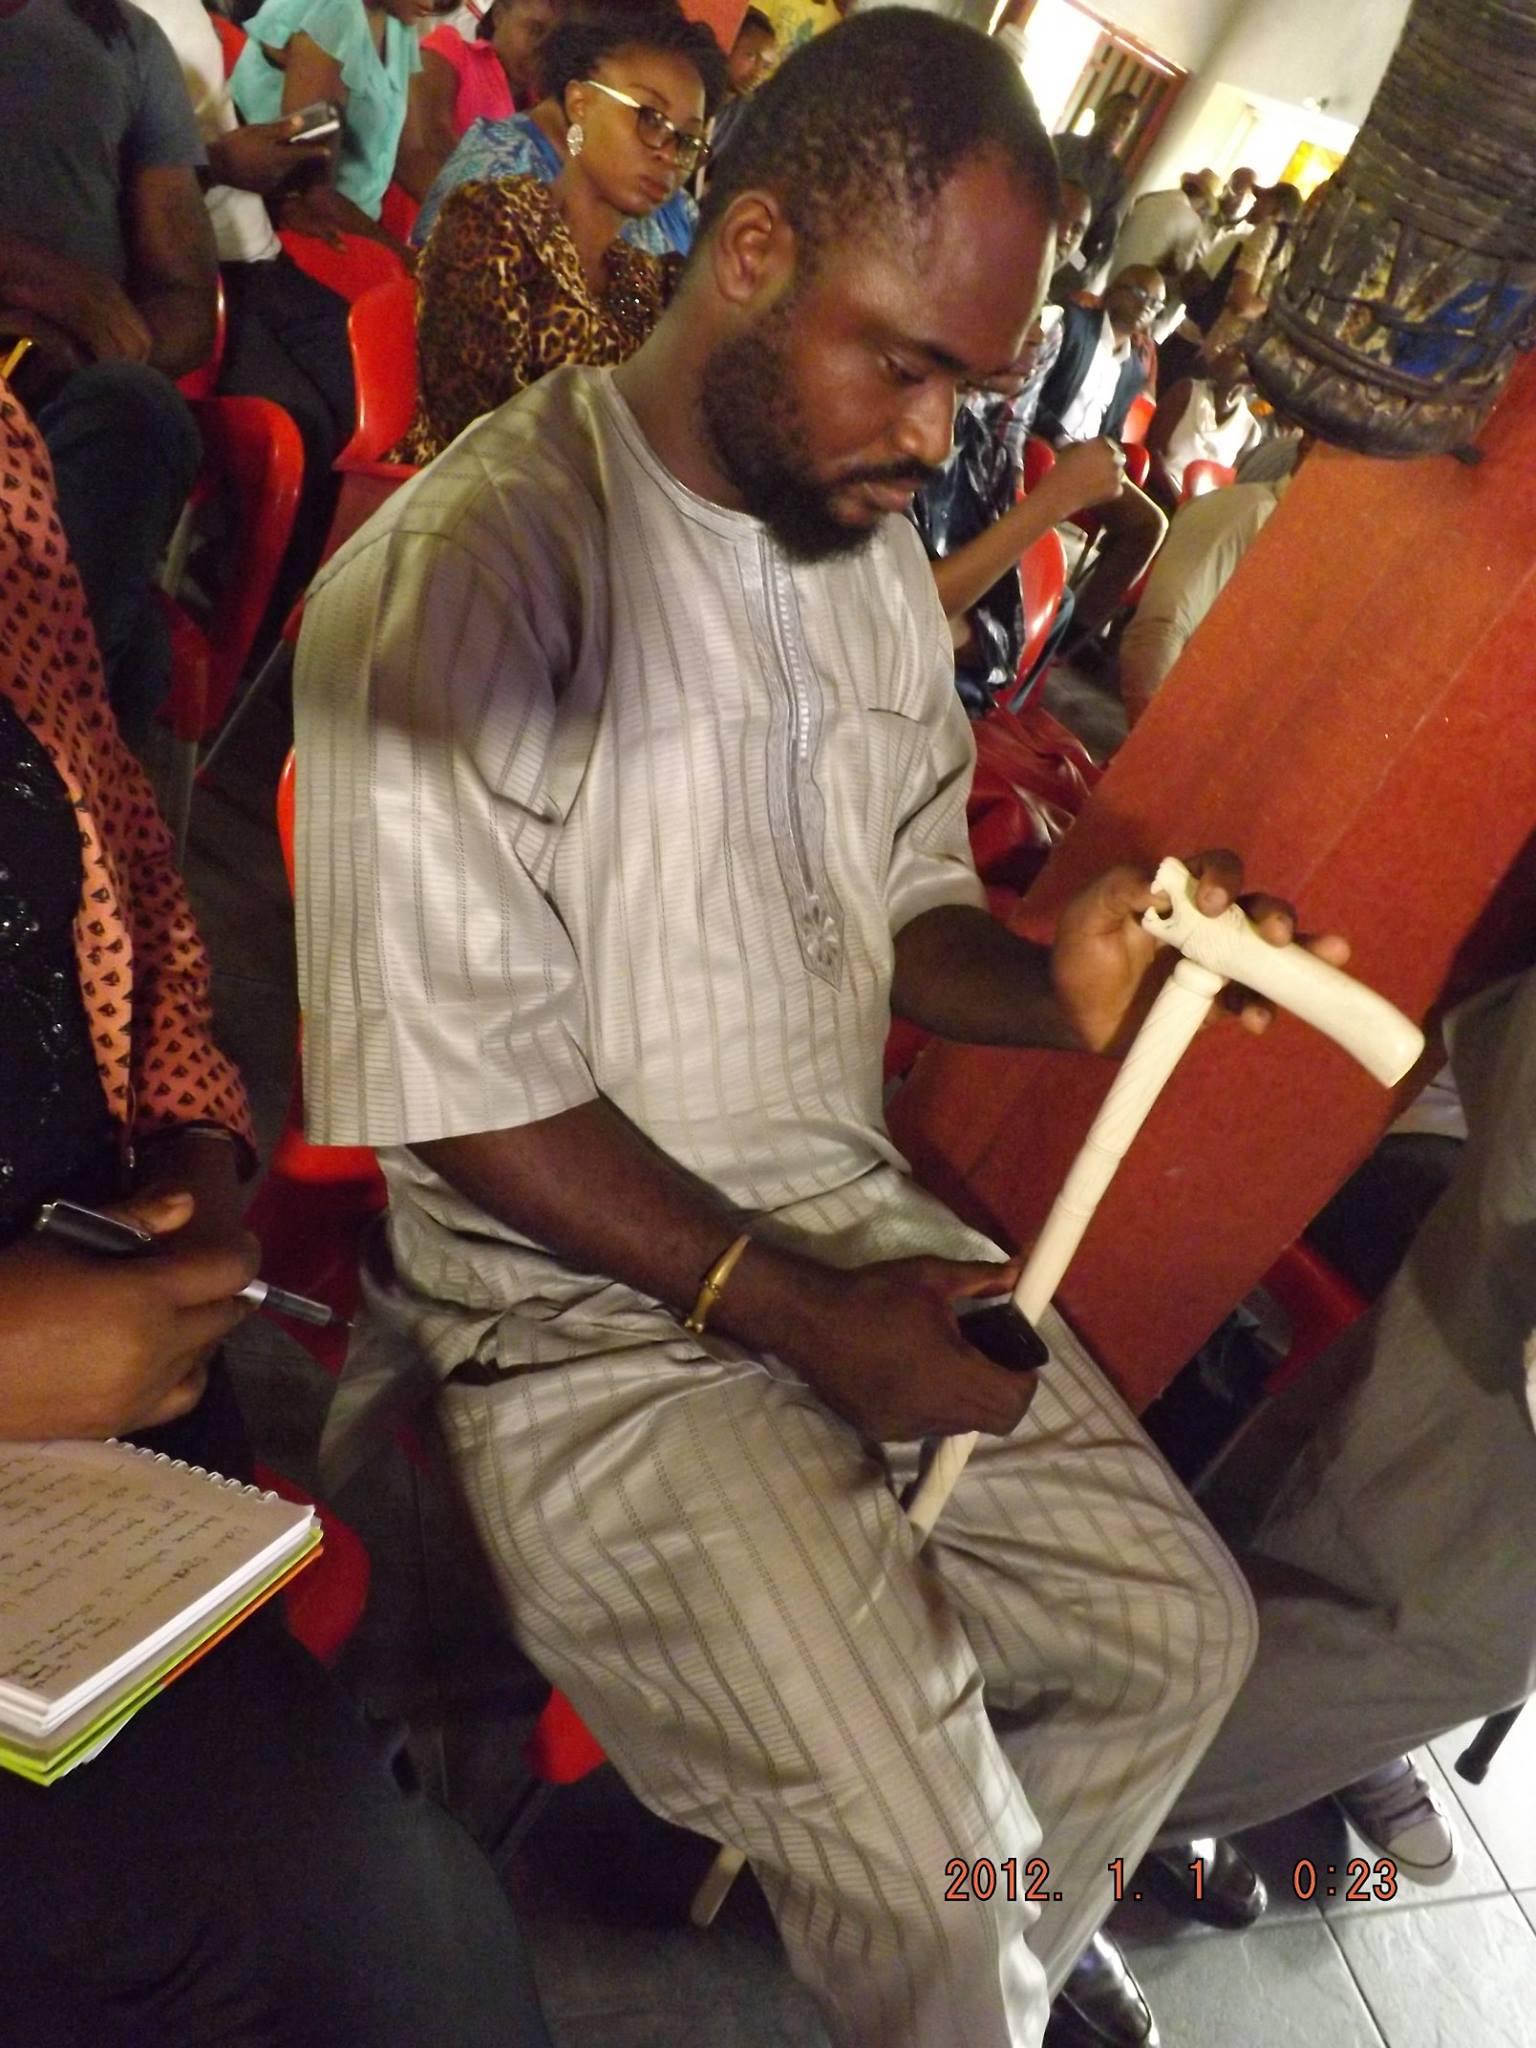 ArtistsVillageSaga;Owie Smart Sues FG For 50Million Naira, Case Begins Hearing at Federal High Court, Ikoyi